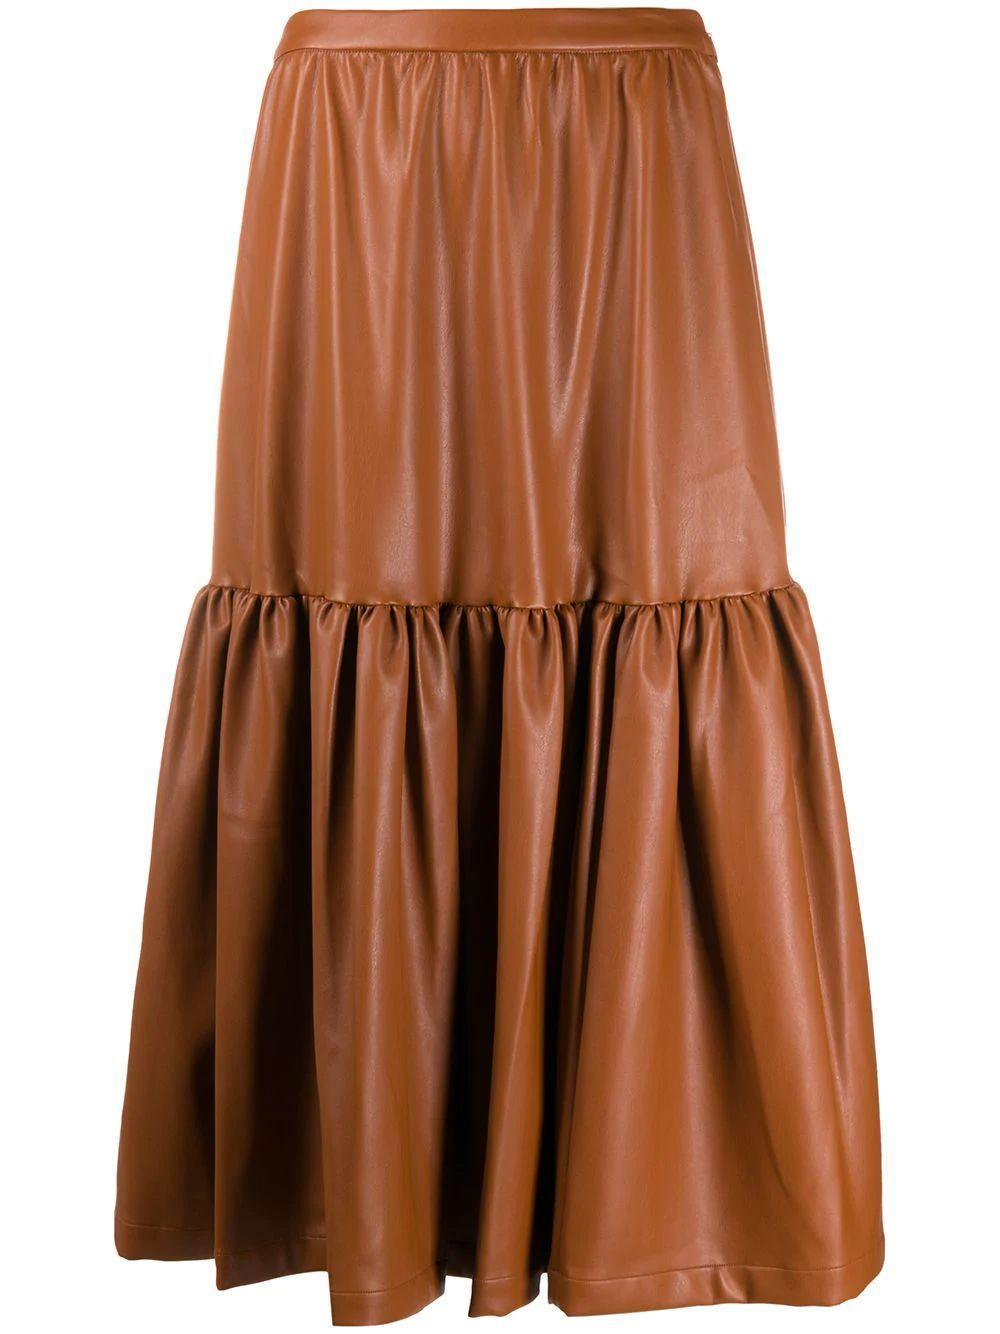 Orchid Vegan Leather Midi Skirt